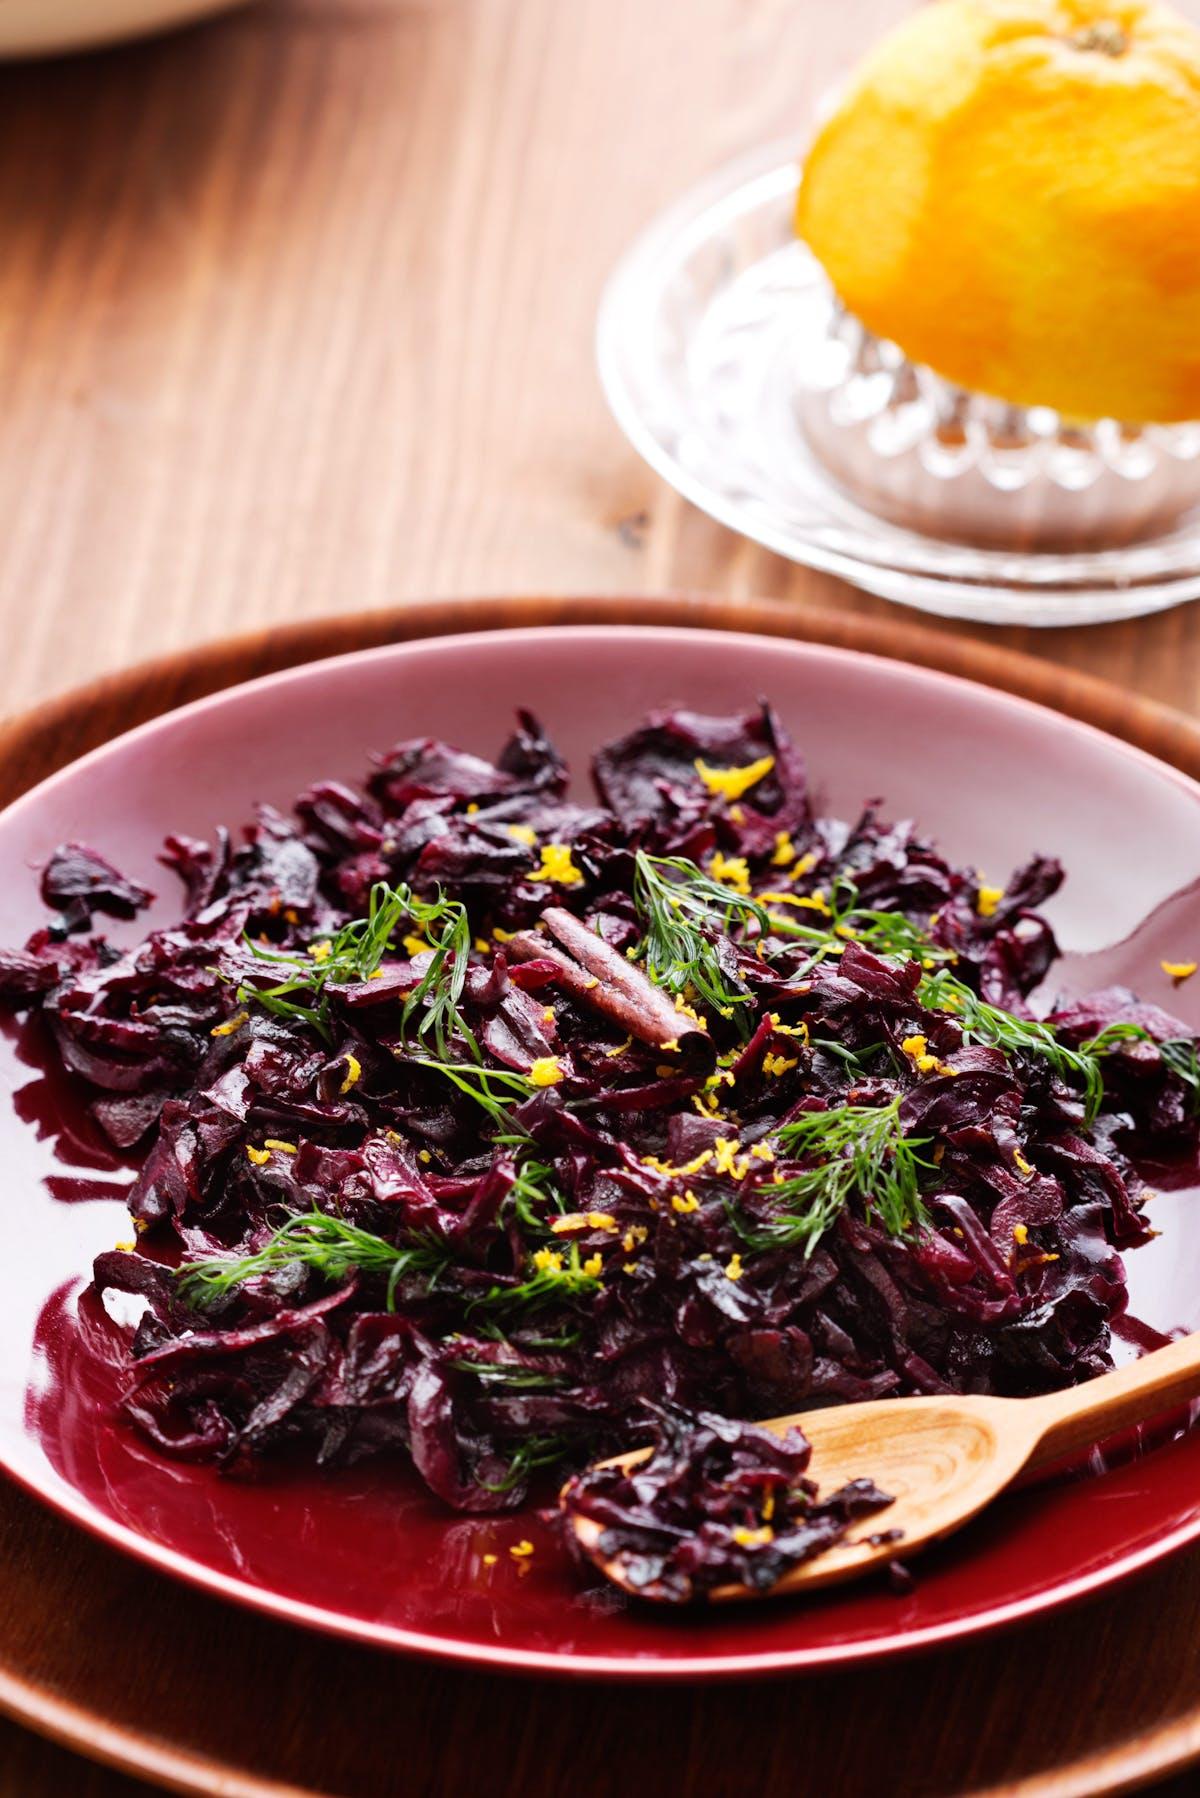 Oriental red cabbage salad